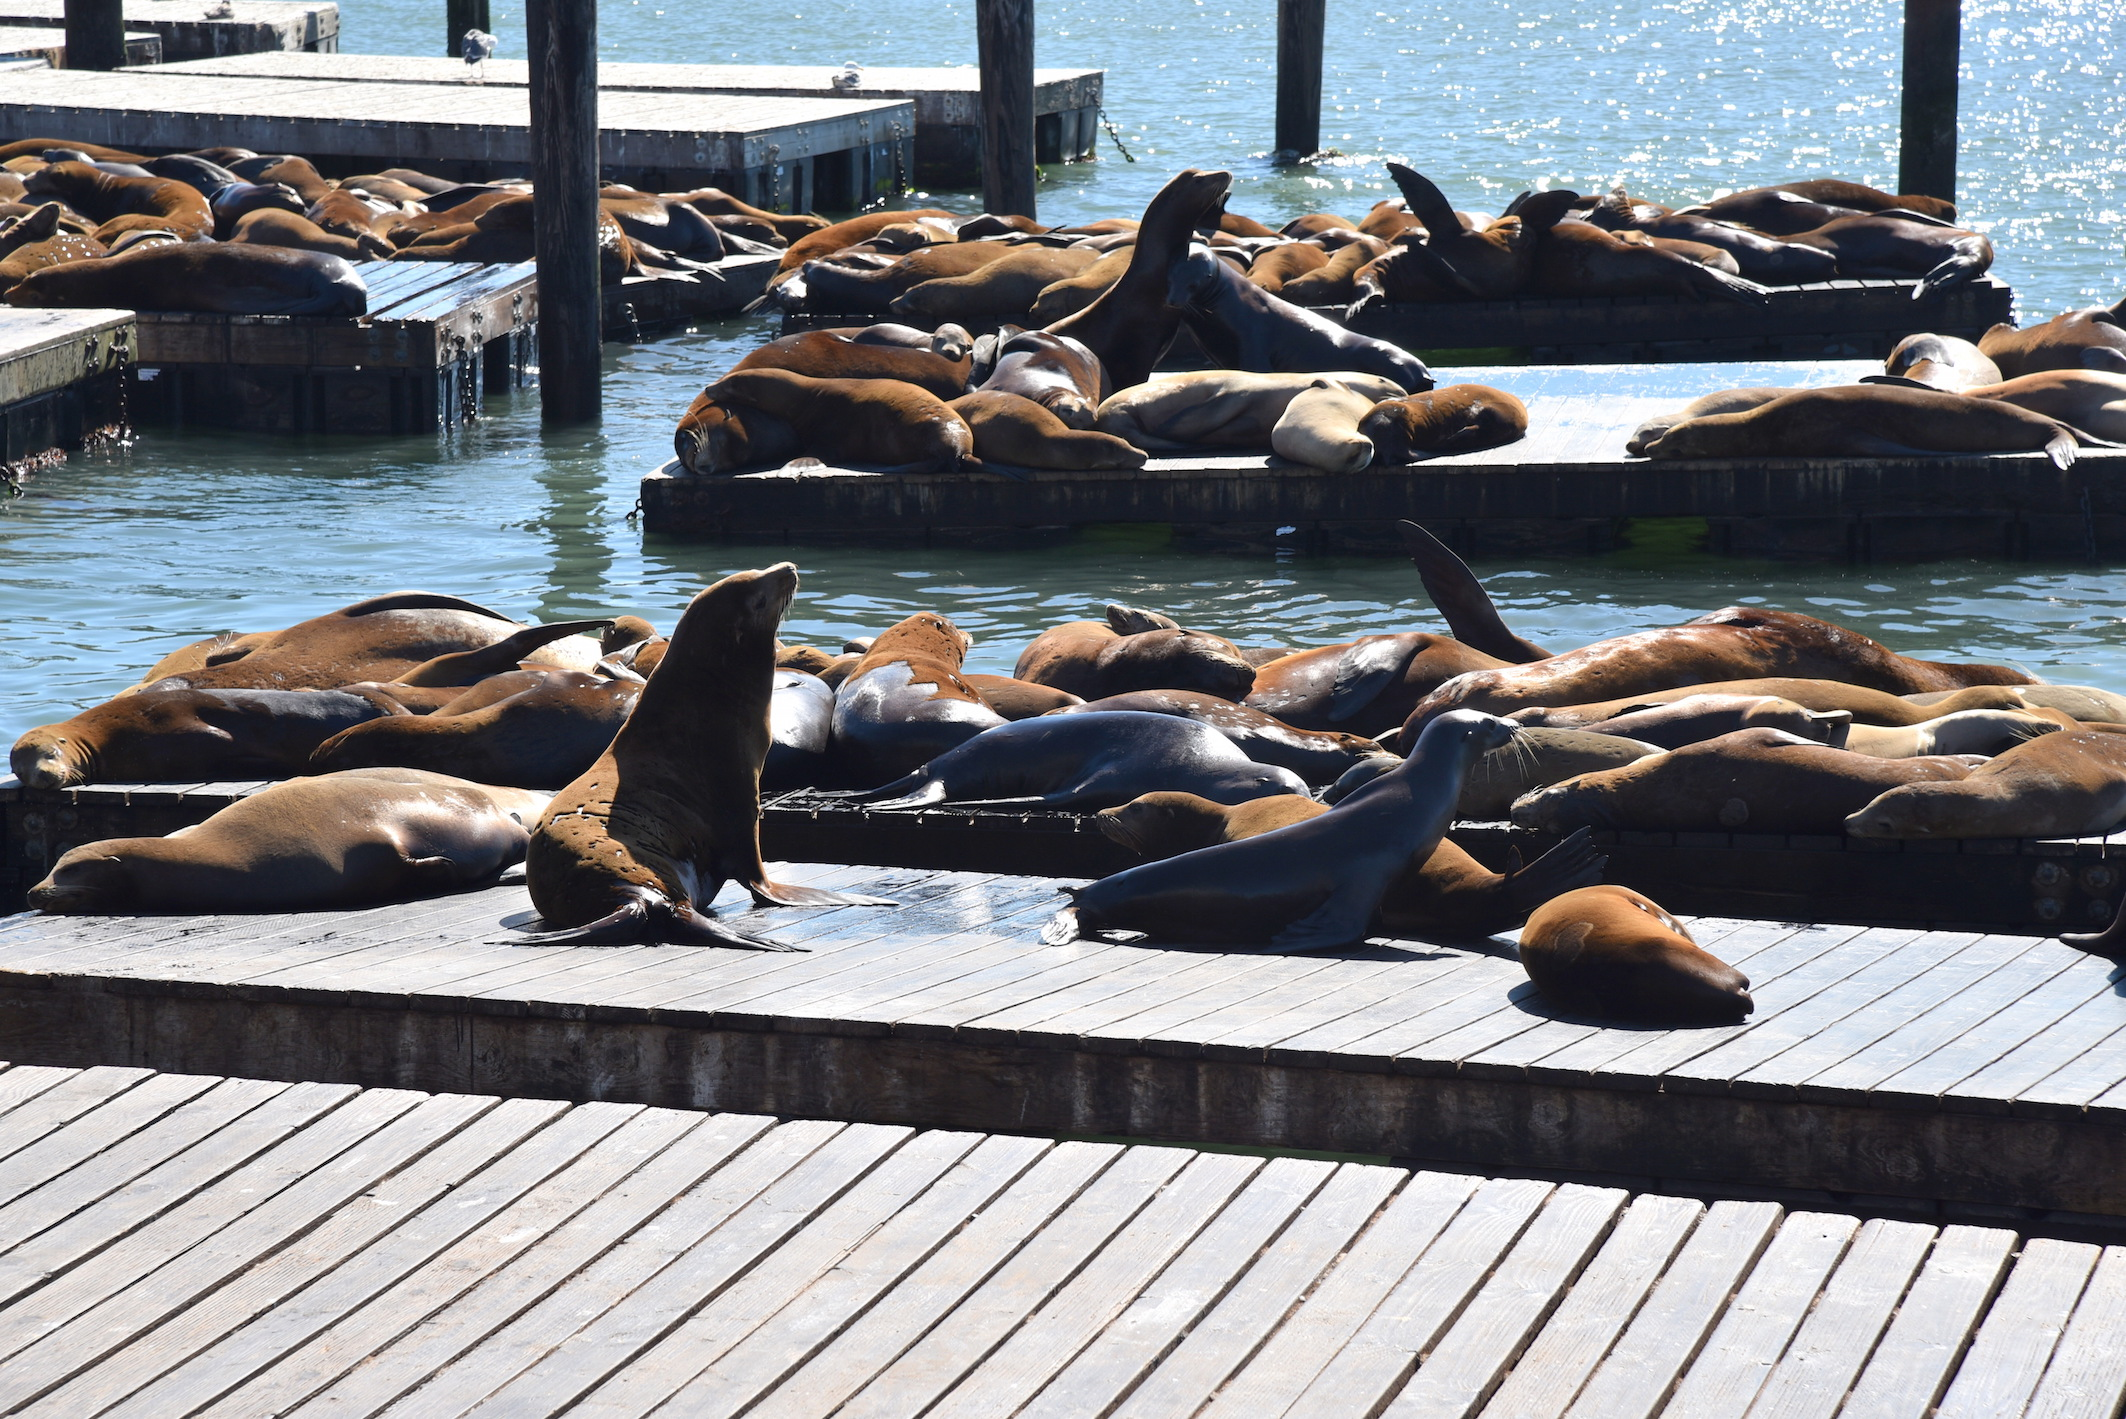 Visiting Fisherman's Wharf in San Francisco - Travel blog